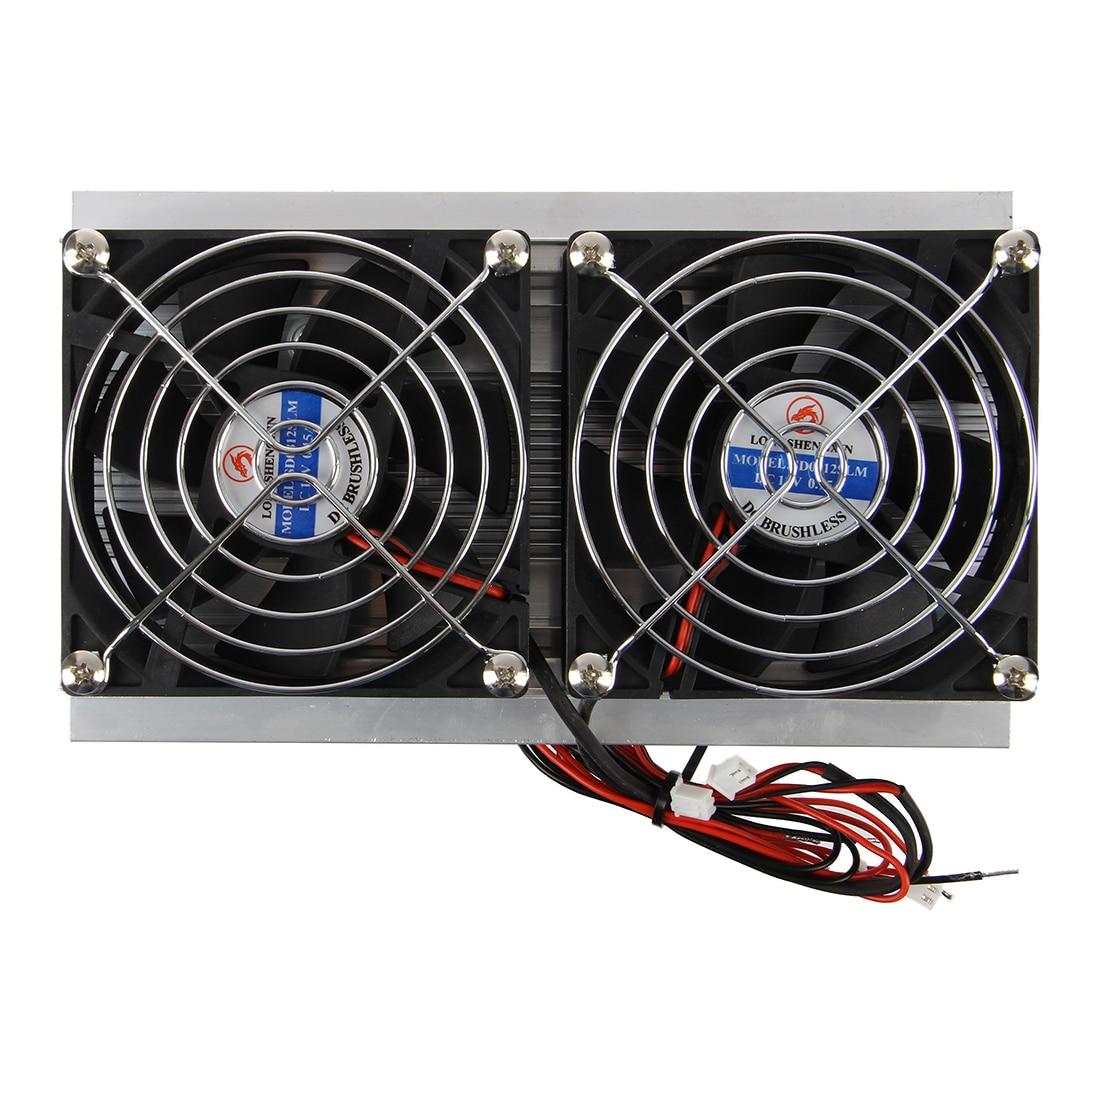 Thermoelectric Peltier Refrigeration Cooling System Kit Cooler Fan DIY